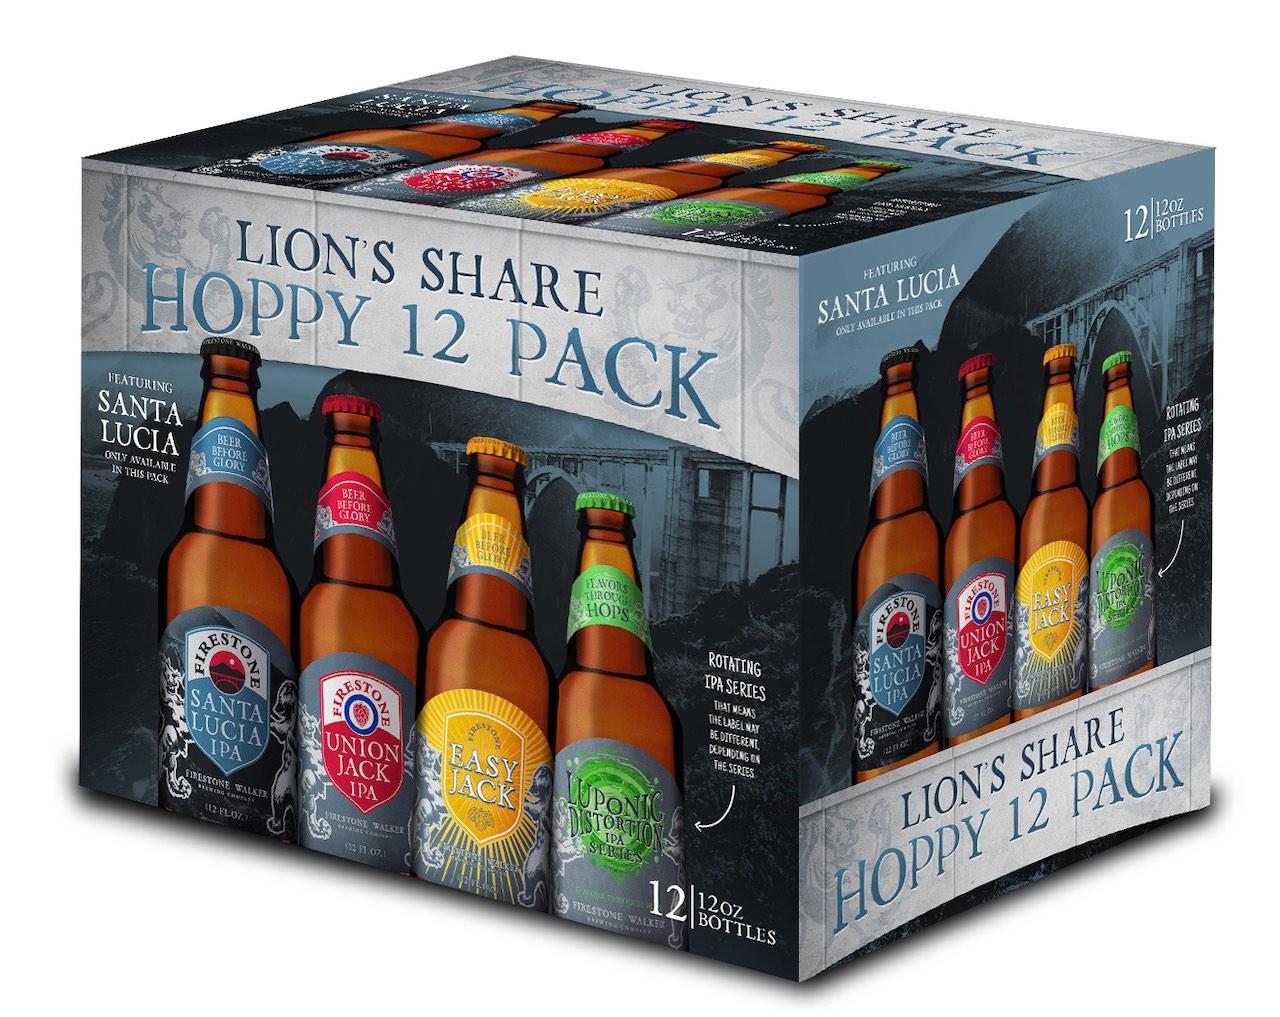 Firestone Walker Hoppy 12 Pack